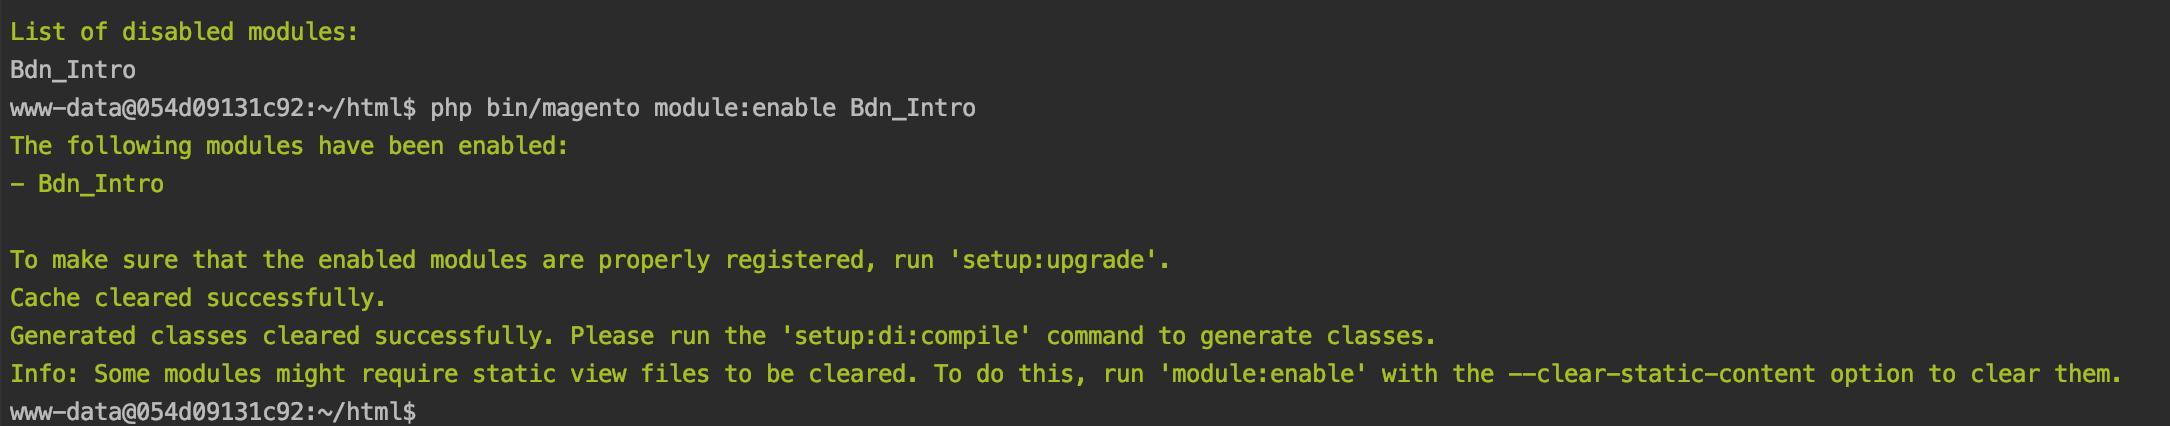 bdn_intro_cli_module_enable